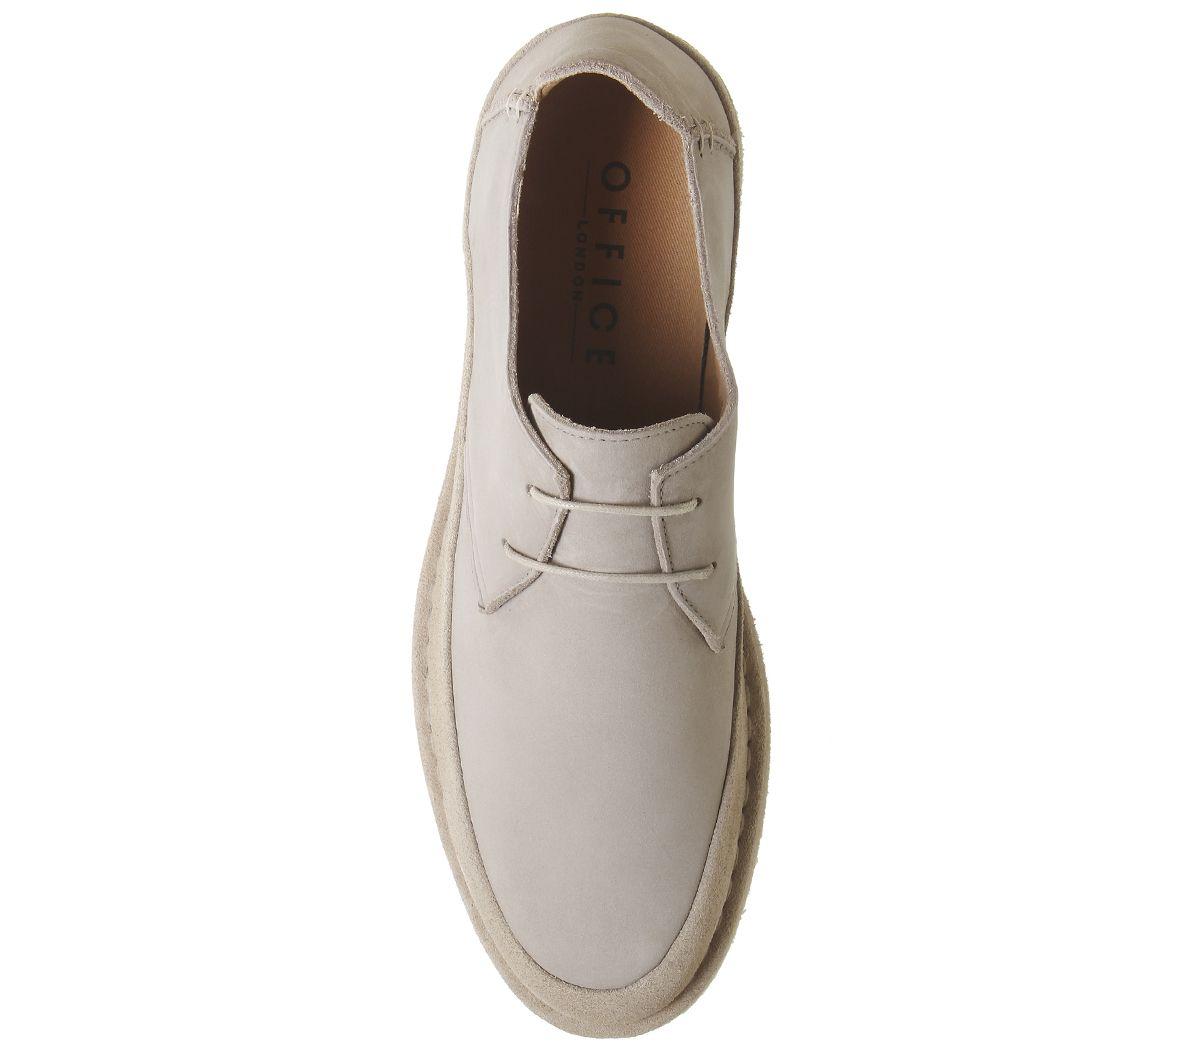 Mens-Office-Lark-Derby-Lace-Up-Shoes-Beige-Nubuck-Casual-Shoes thumbnail 5